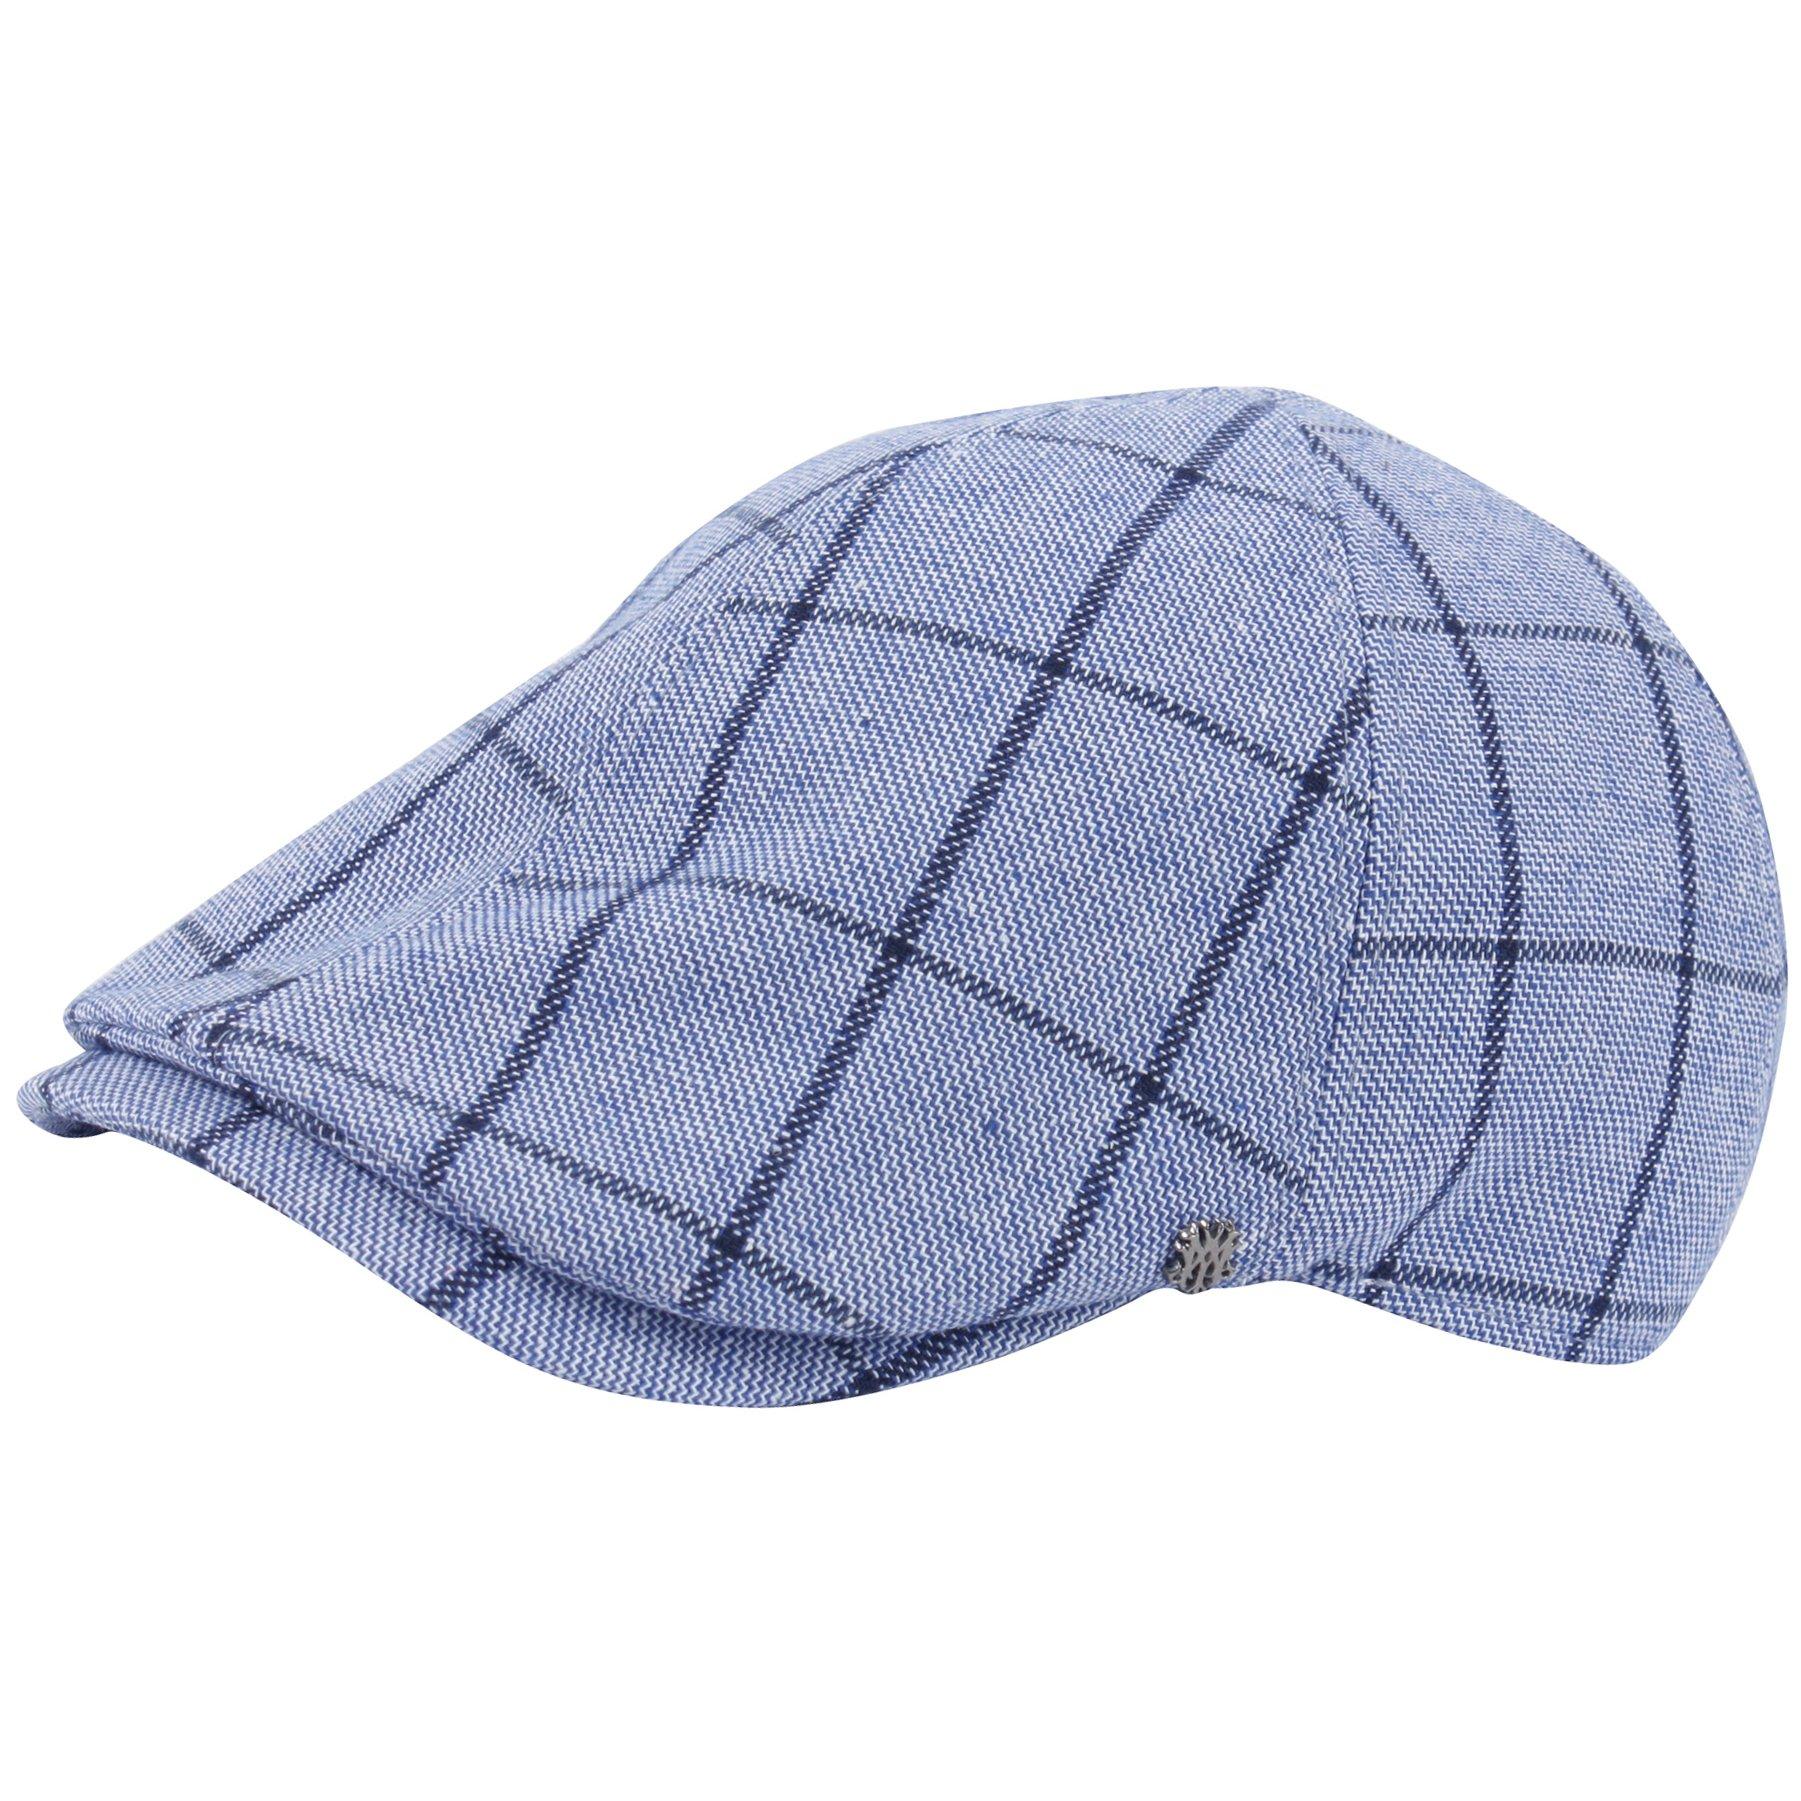 RaOn G96 newsboy Cap Daily Irish Check Pattern Summer Cool Plus Big Size XL XXL Hat (Blue)